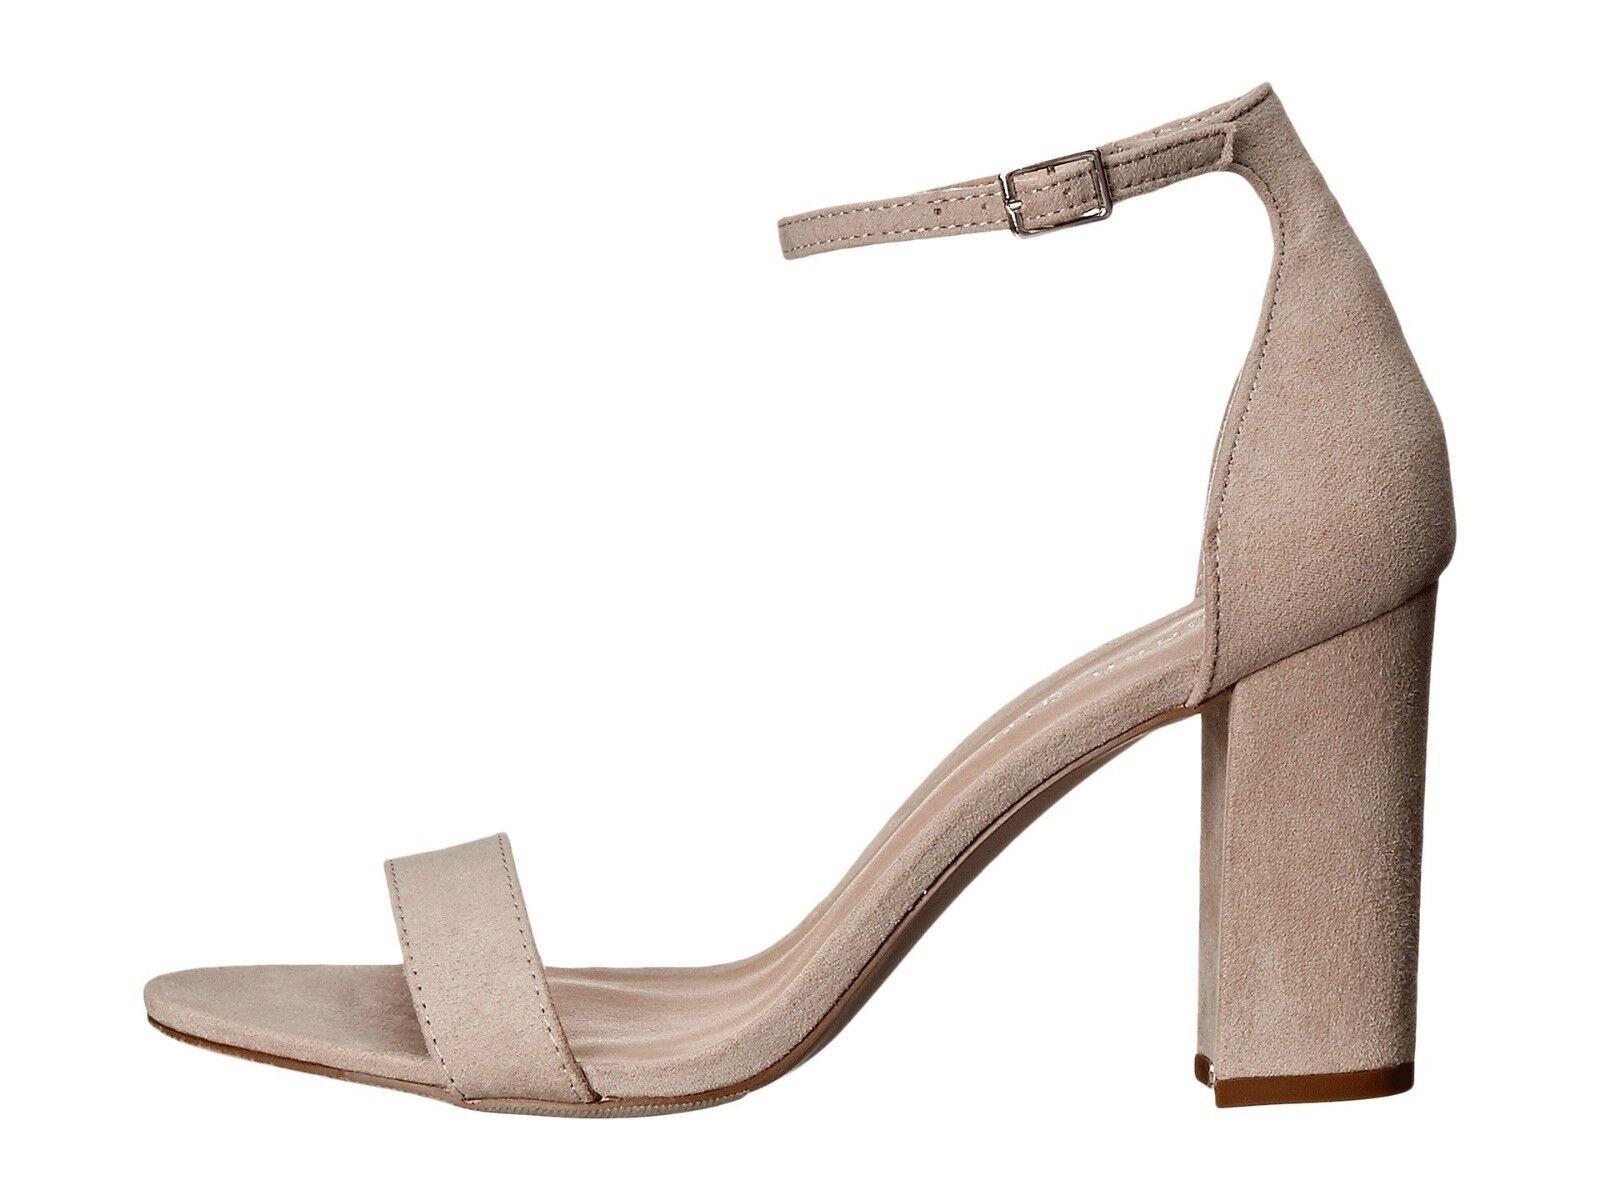 Madden Girl Beella Block Heel Sandals bluesh Fabric Bridal Bridesmaid Size 8.5